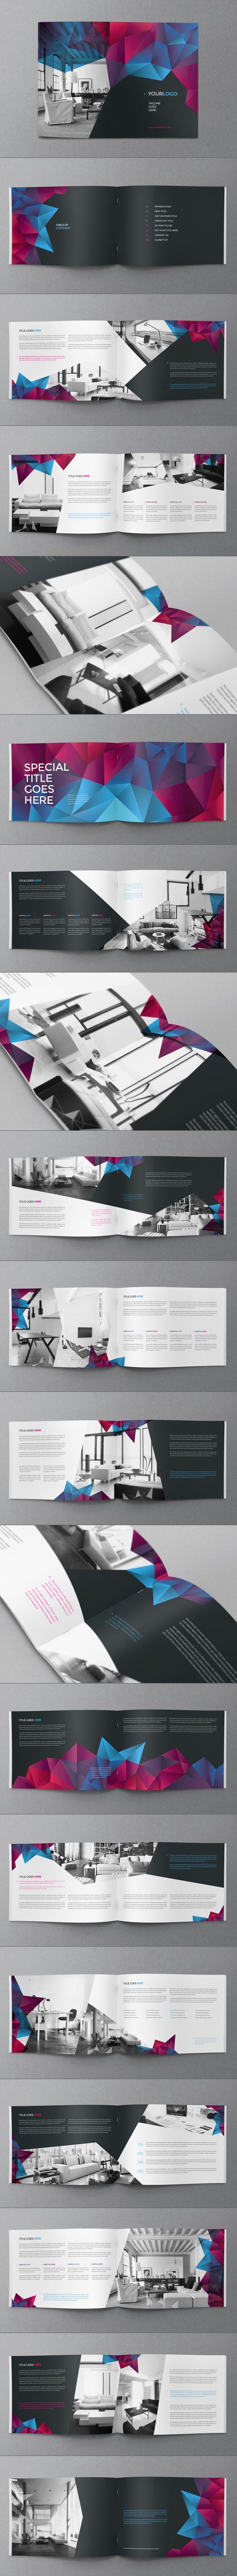 Cool Modern Brochure. Download here: http://graphicriver.net/item/cool-modern-brochure/7813777?ref=abradesign #brochure #design